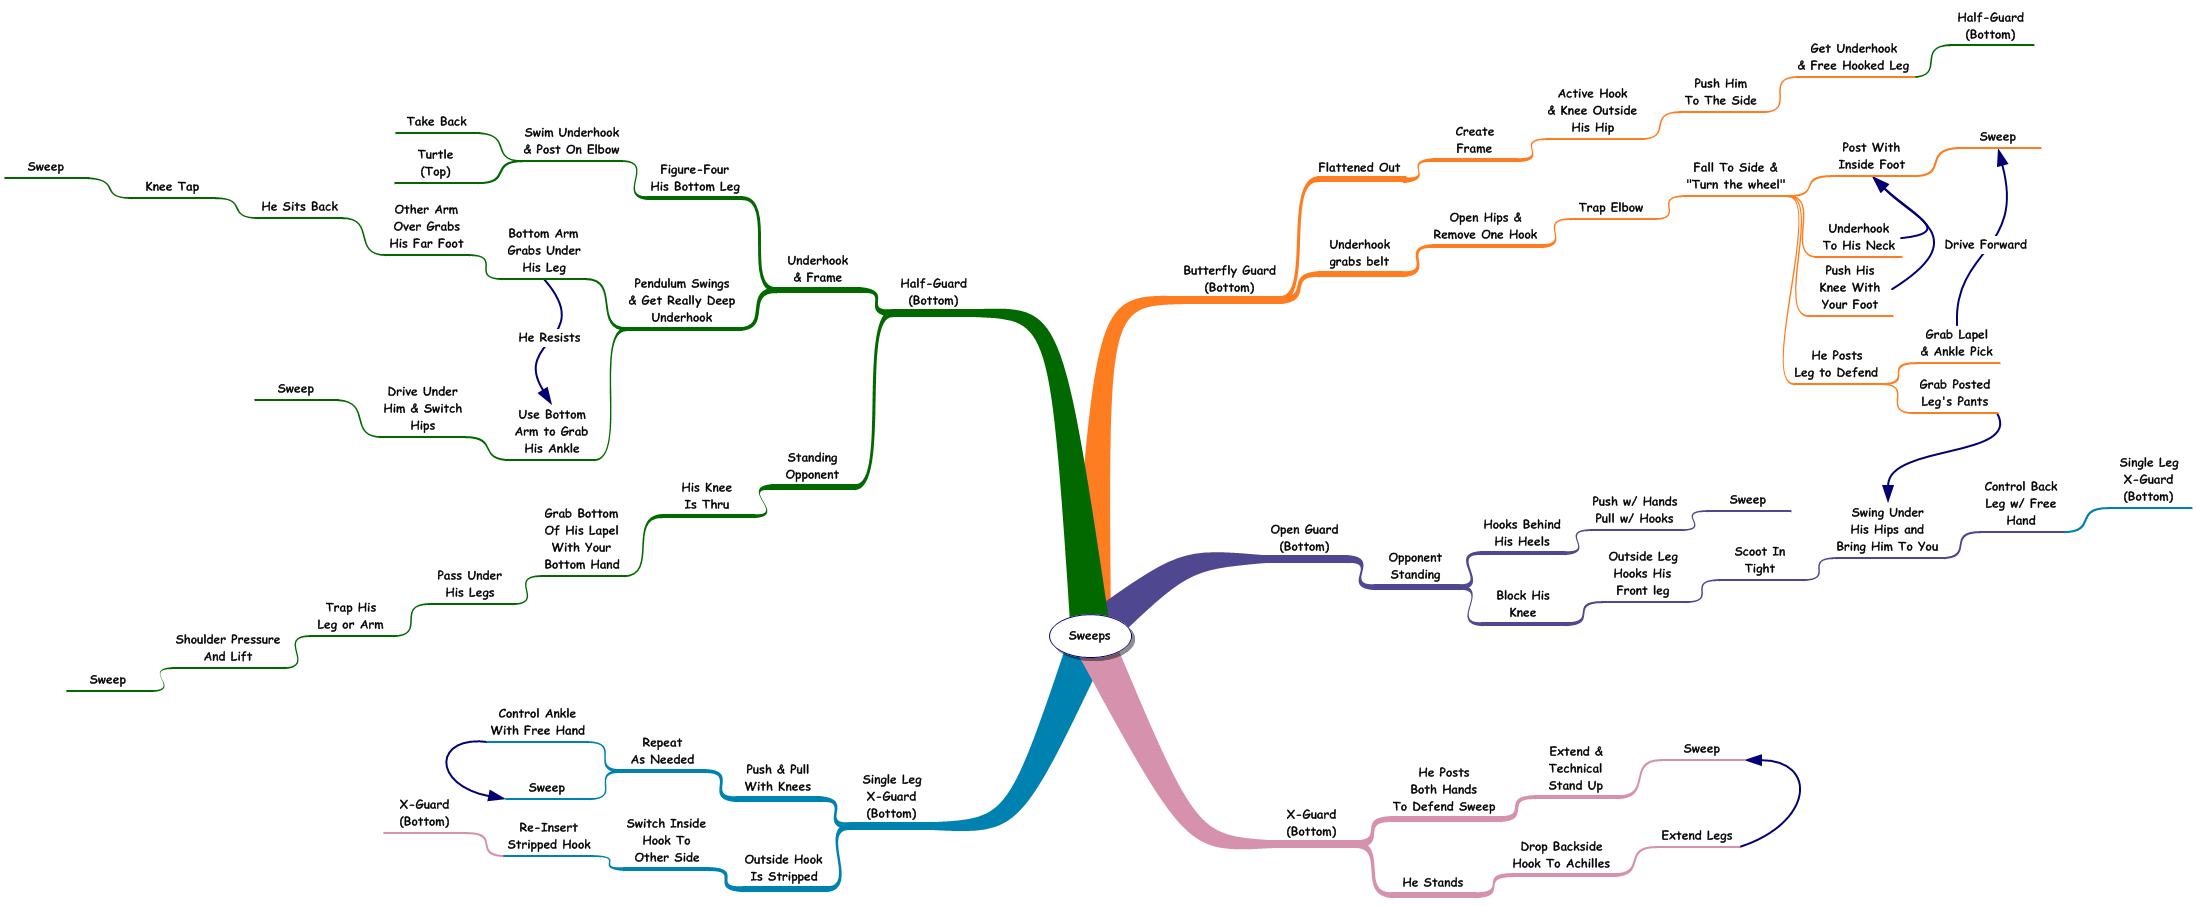 bjj flow chart virma moordspel co rh virma moordspel co jiu jitsu techniques diagrams Jiu Jitsu Quotes